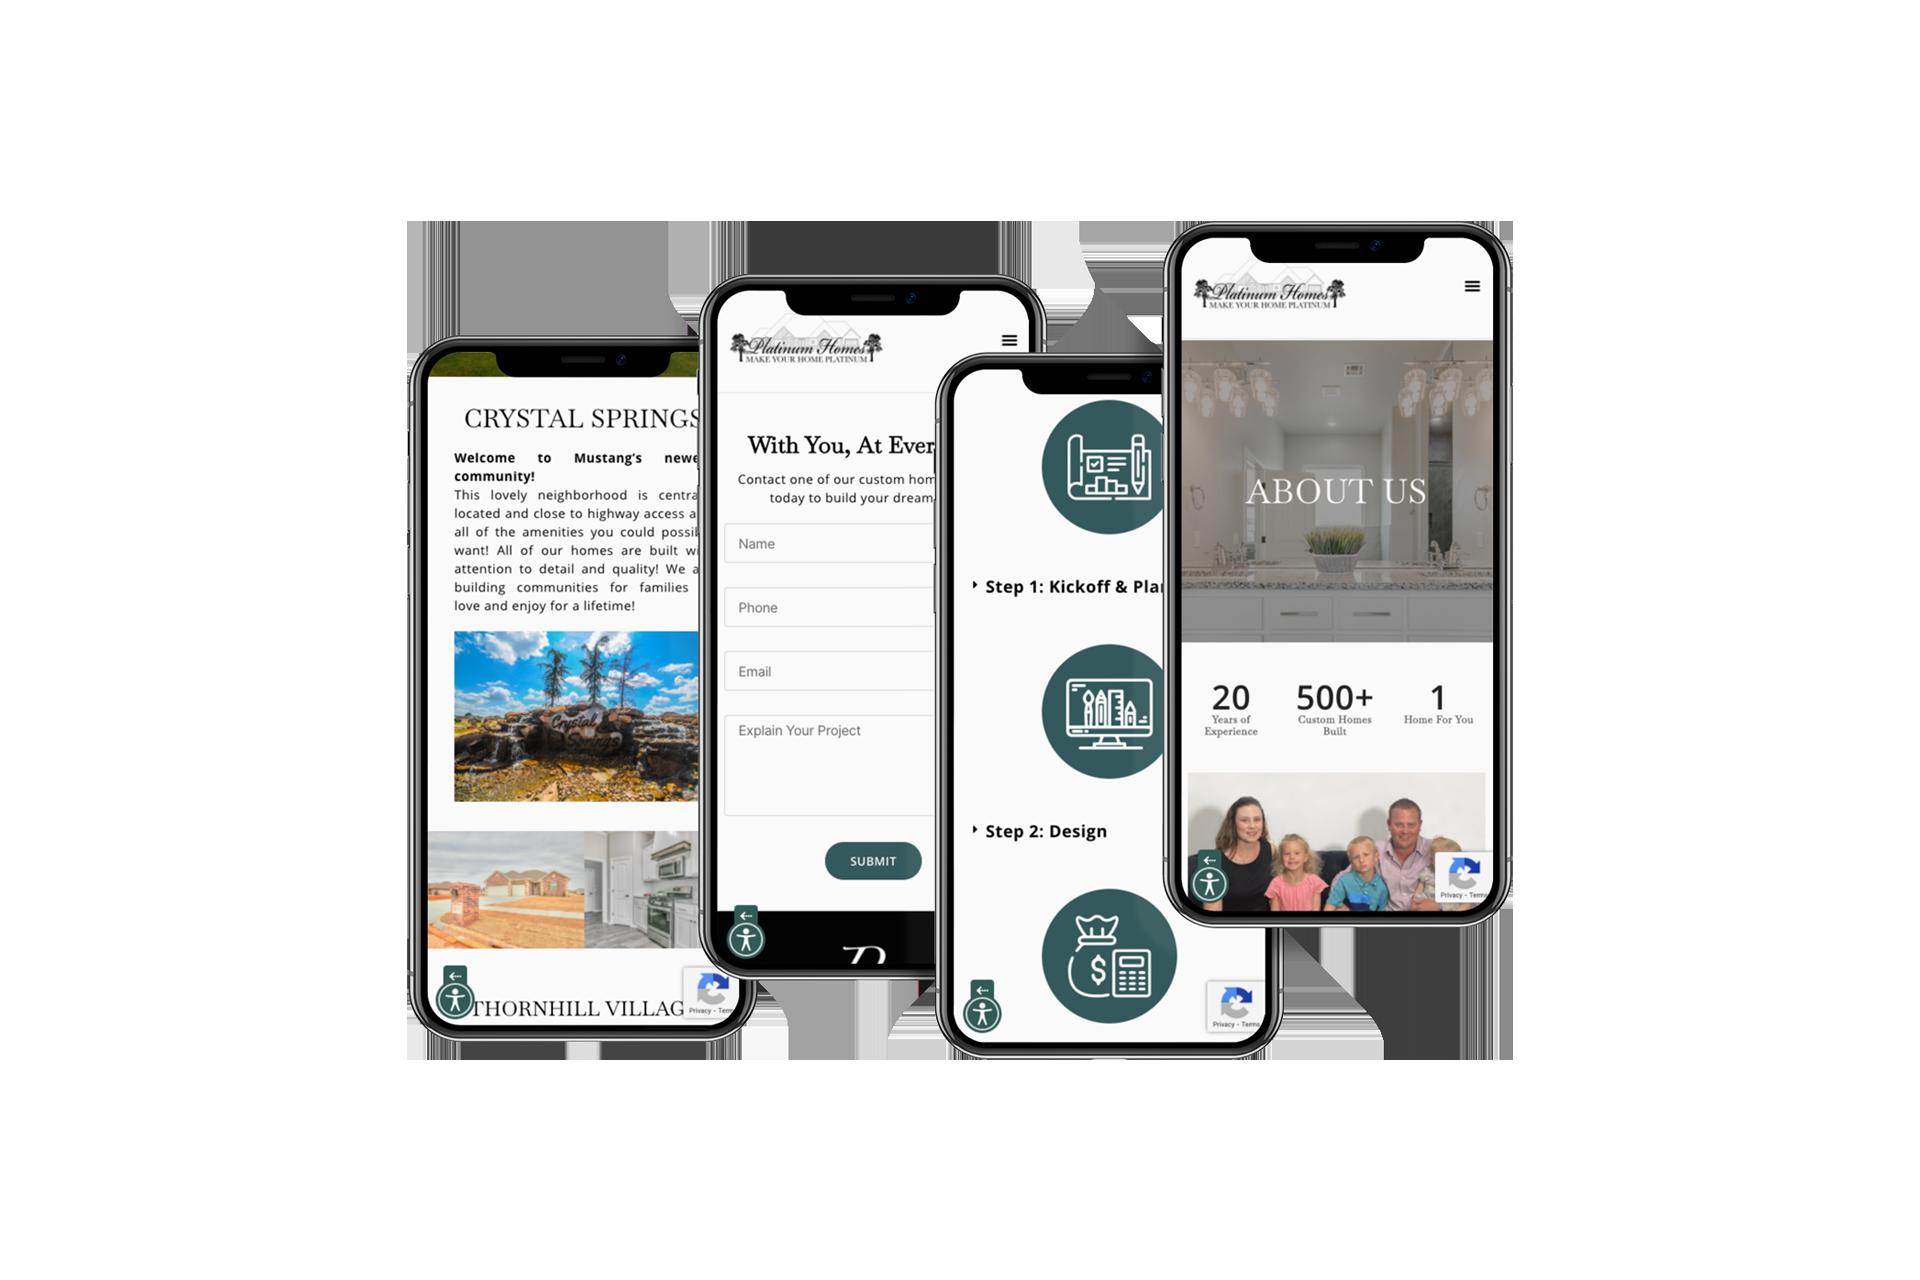 platinum homes website on a phone